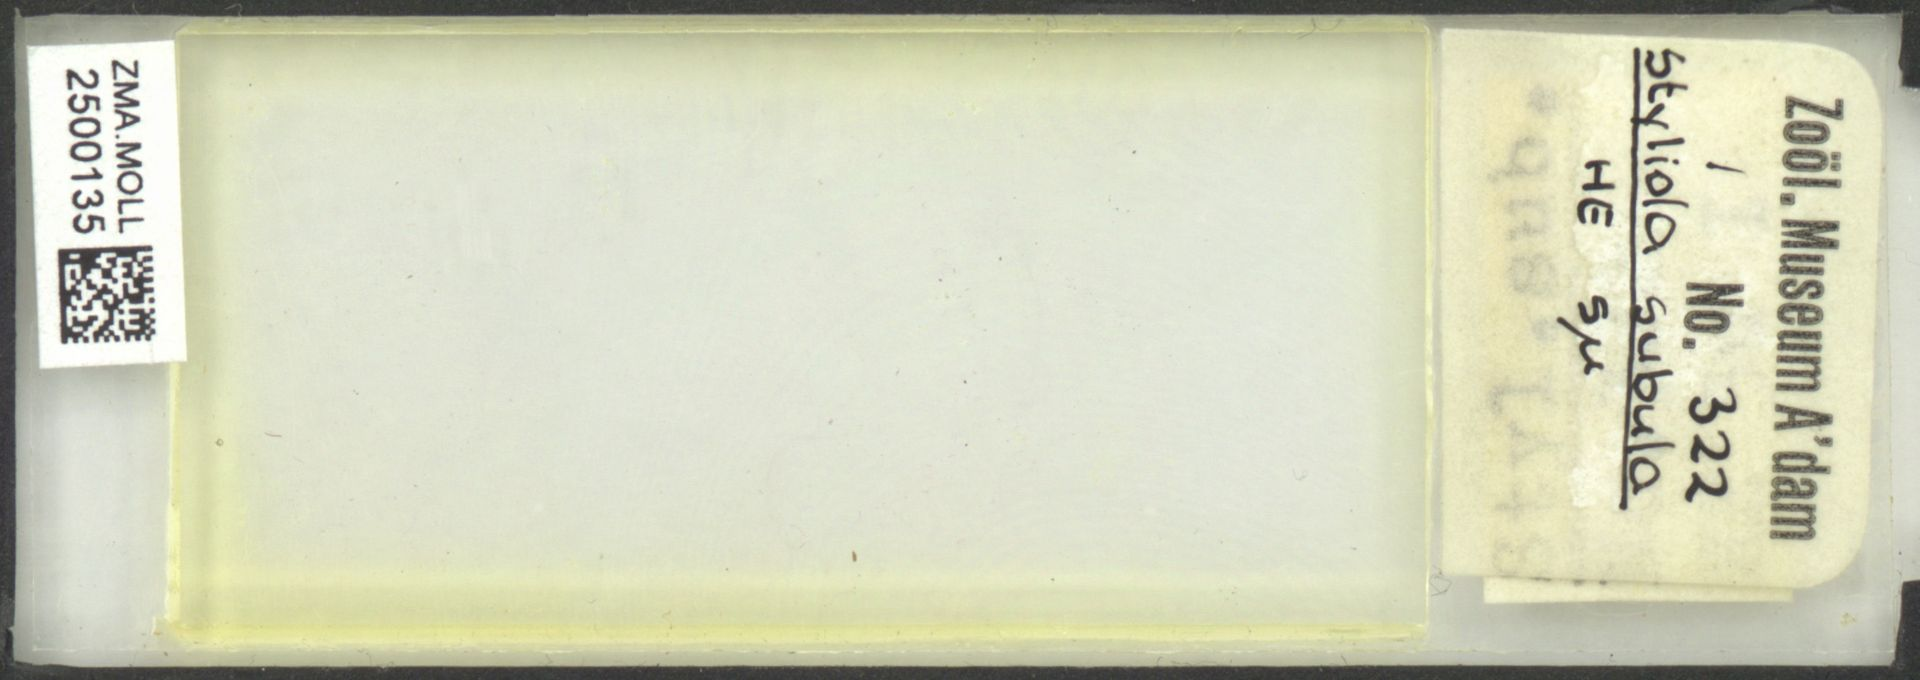 ZMA.MOLL.2500135 | Styliola subula (Quoy & Gaimard, 1827)